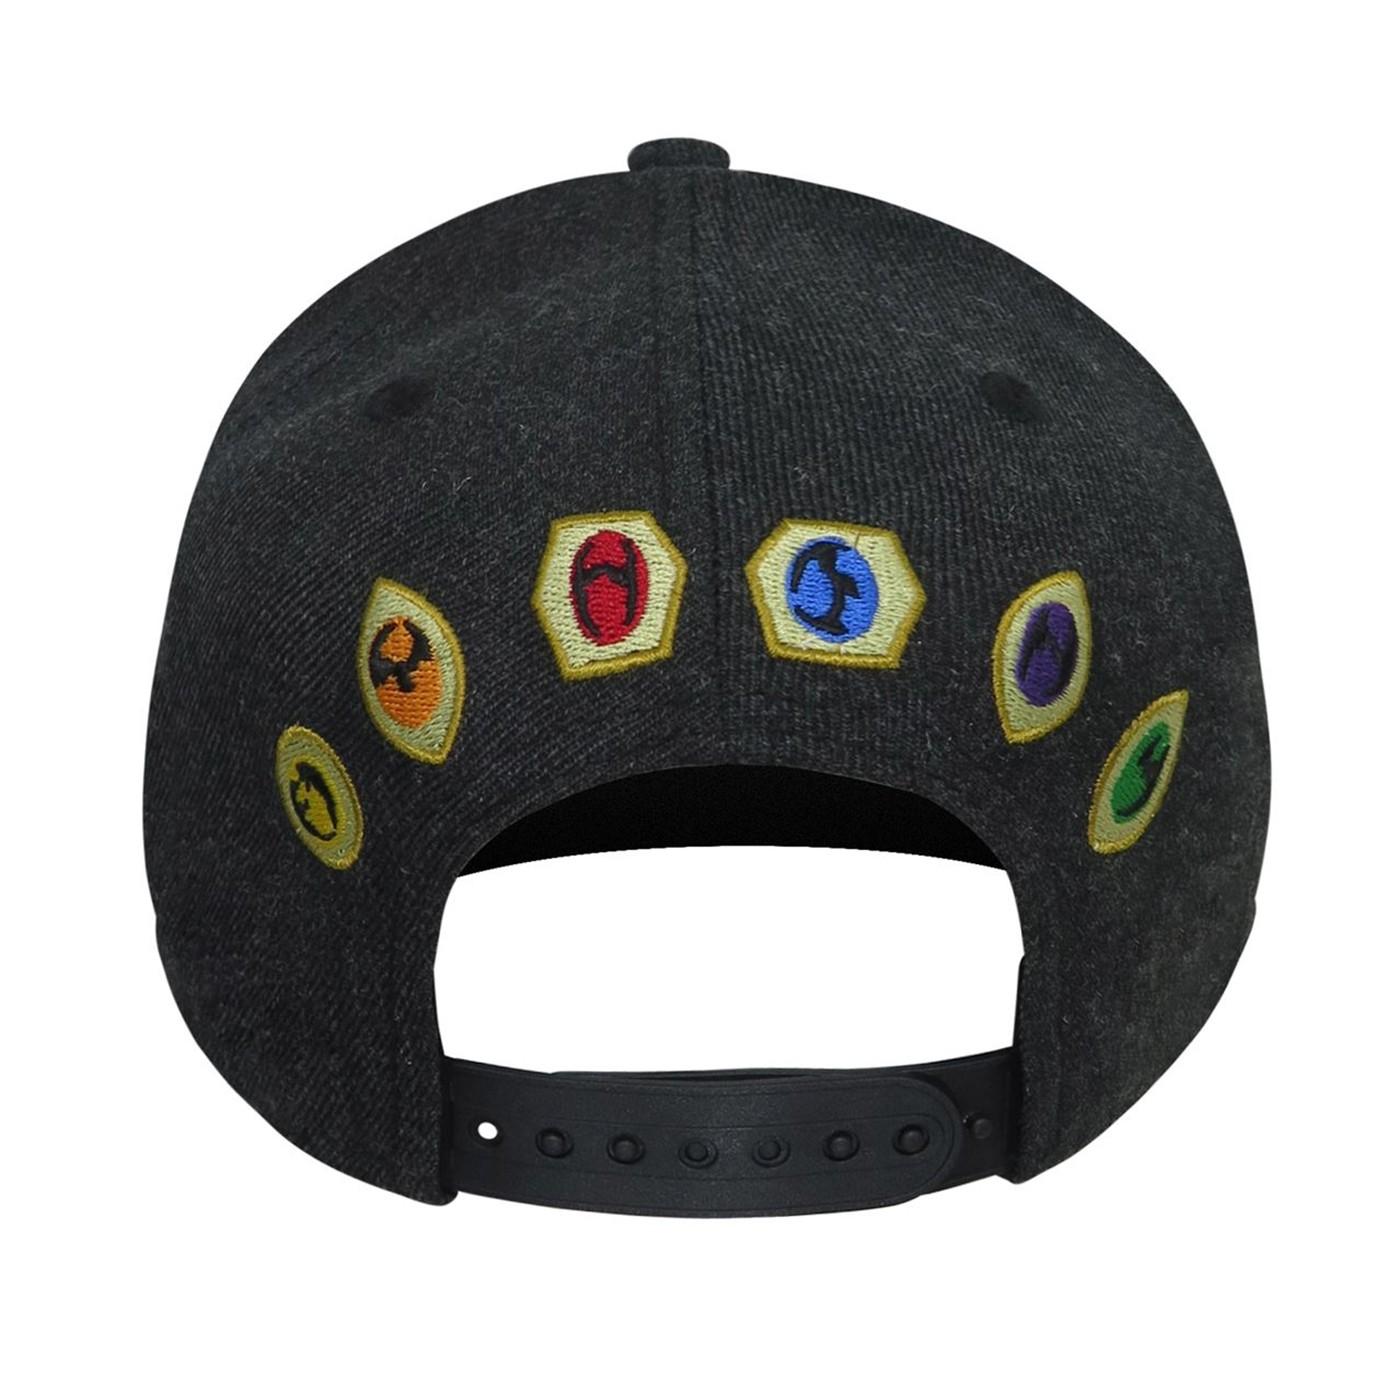 Avengers Infinity War Logo 9Fifty Adjustable Hat